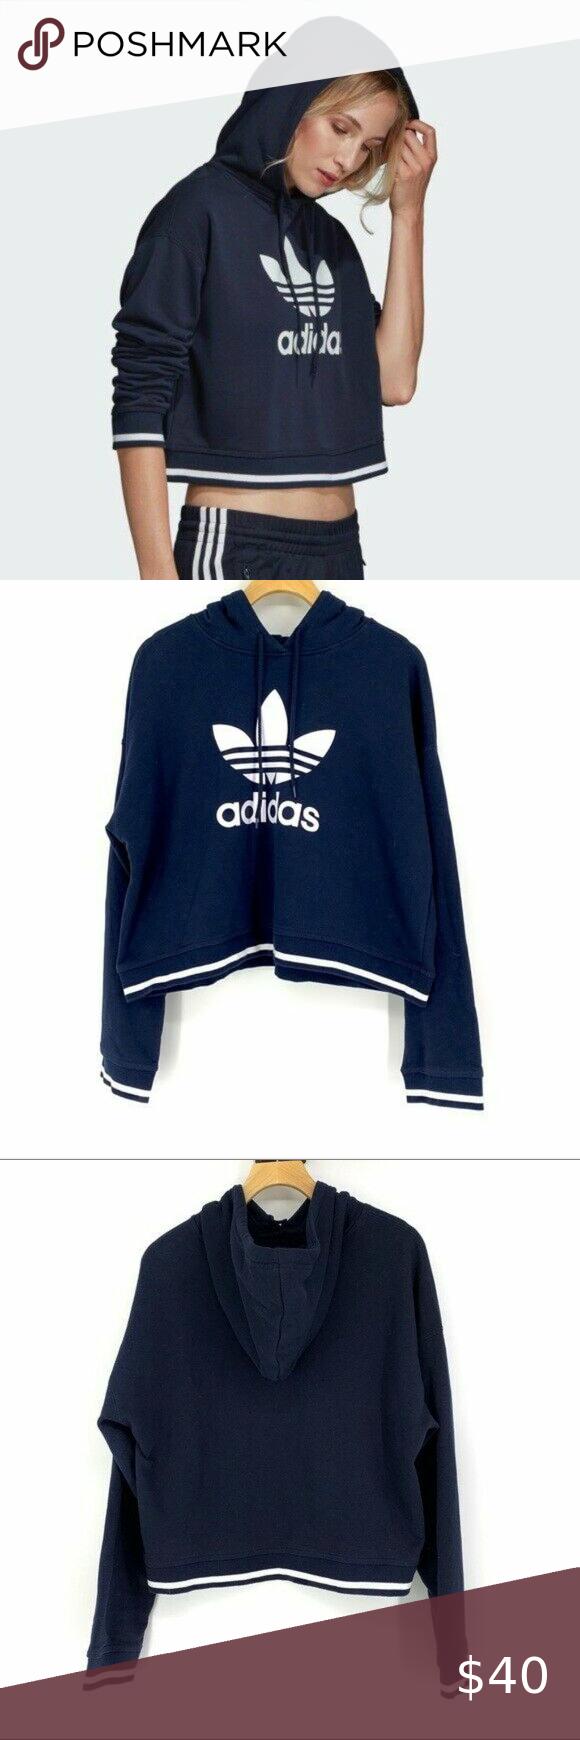 Adidas Navy Logo Cropped Hoodie Sweatshirt Large Crop Sweatshirt Hoodie Sweatshirts Hoodie Sweatshirts [ 1740 x 580 Pixel ]